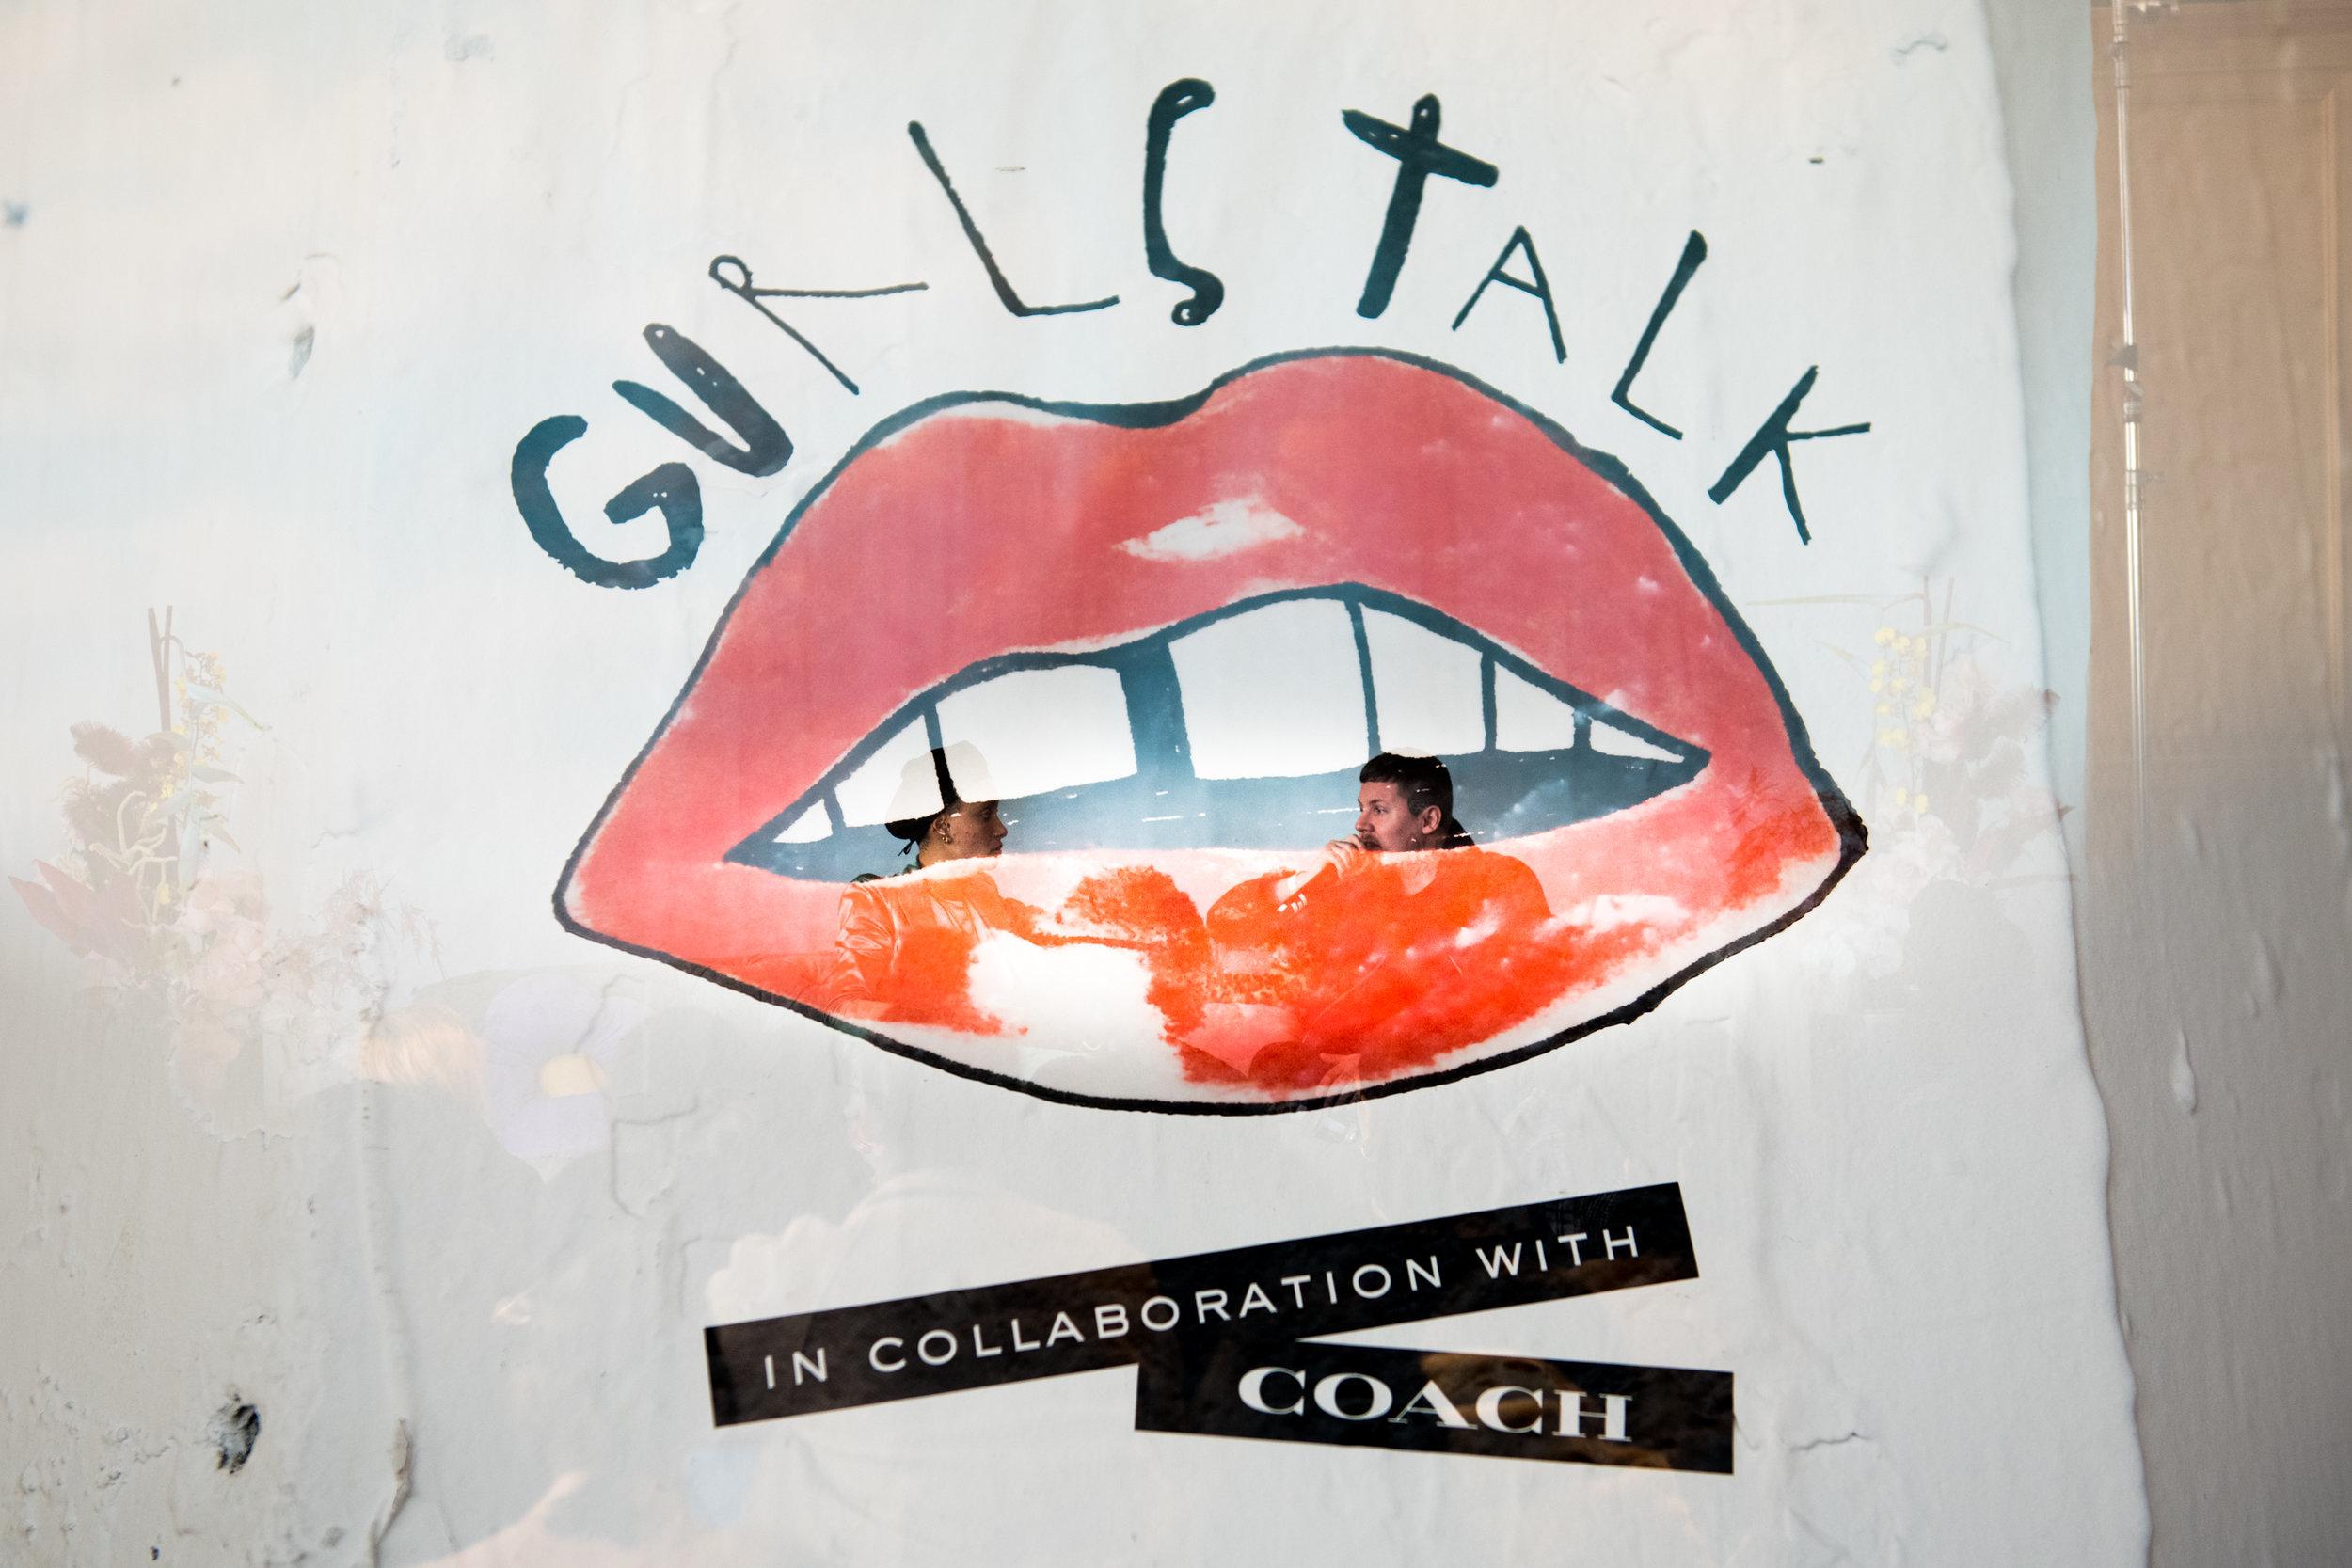 Coach_Gurls_Talk_031118-579.jpg